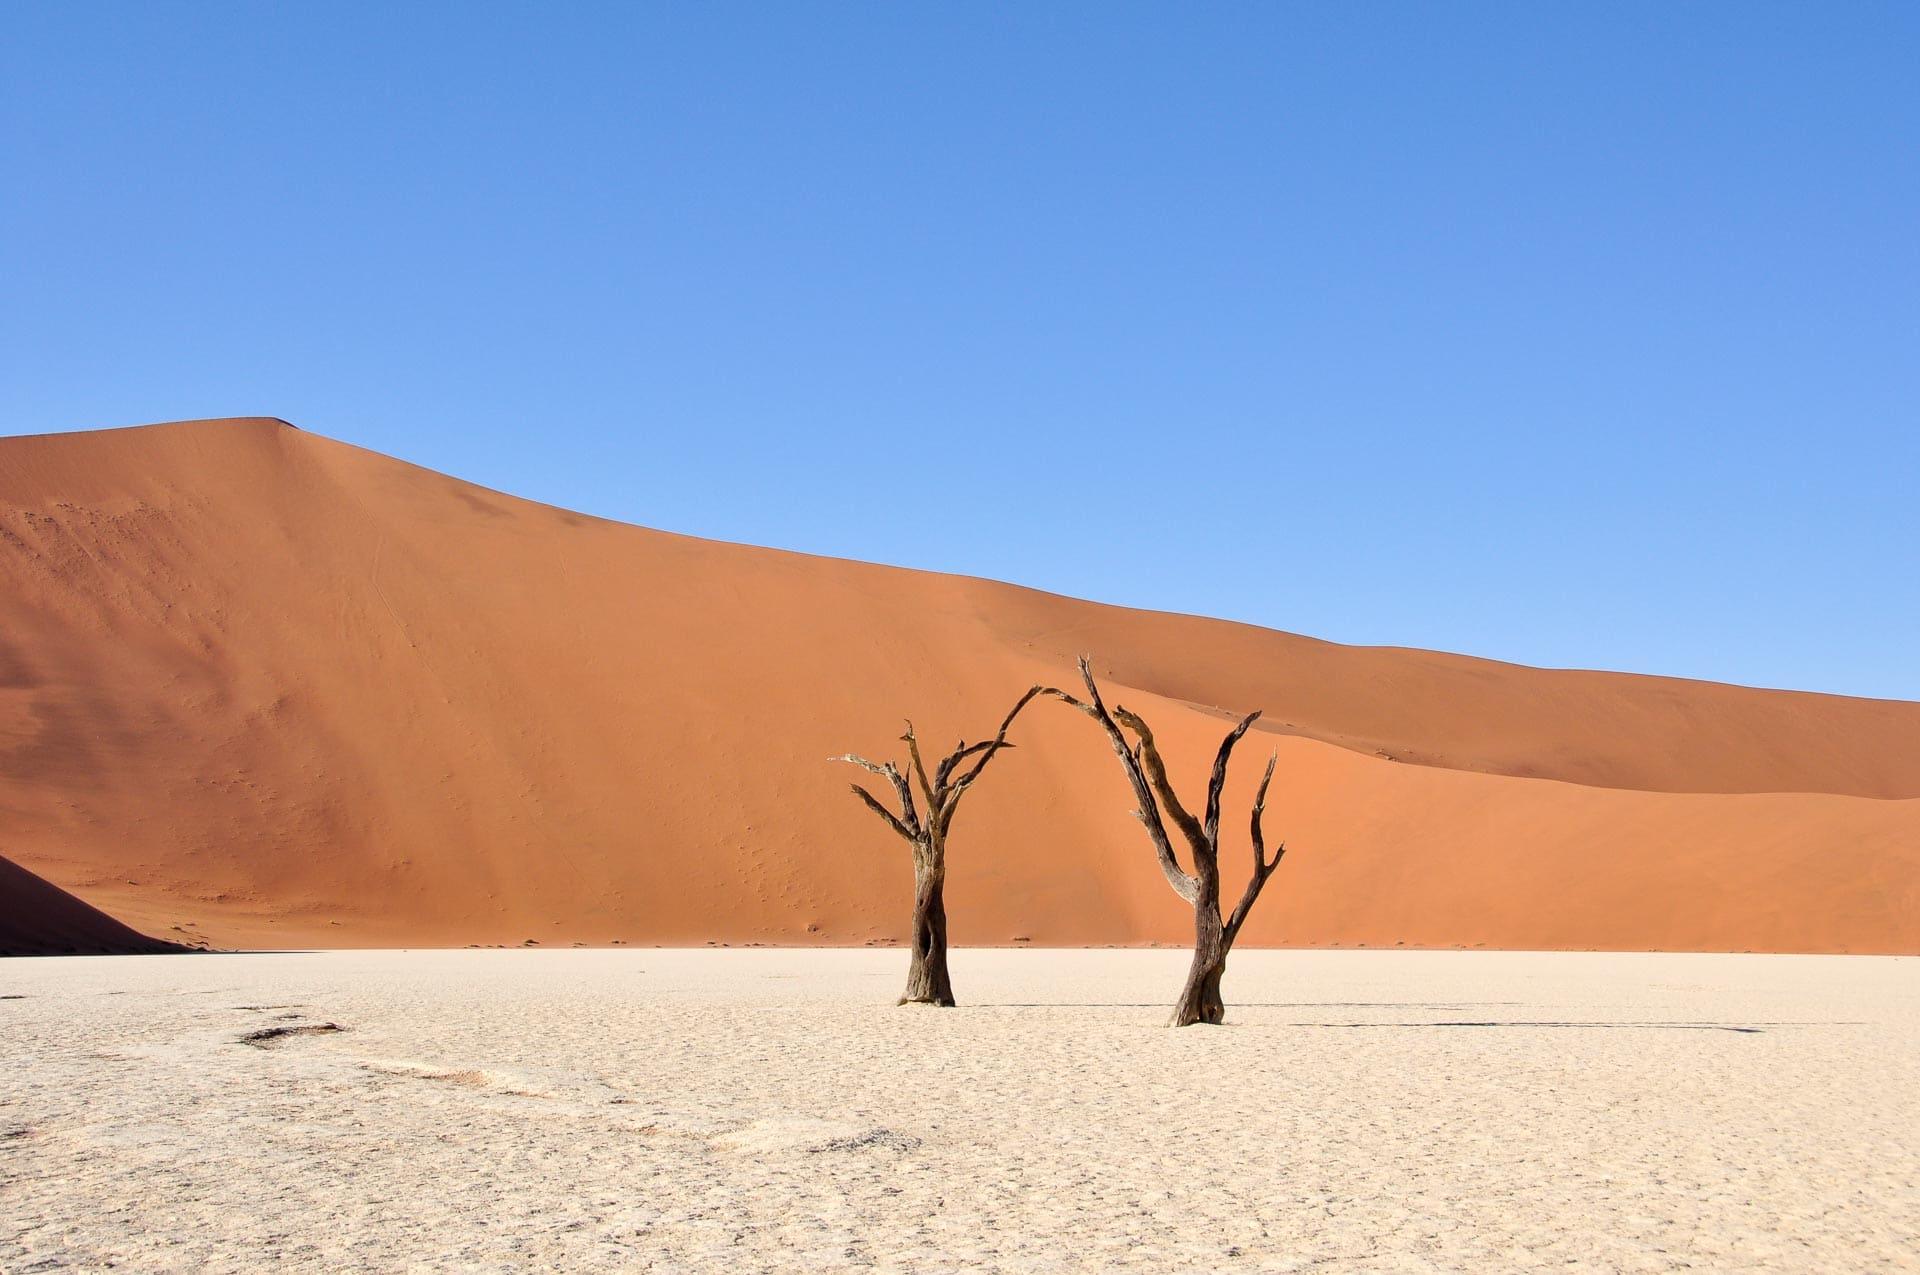 Sossuvlei-Wueste-Namib-Namibia-Globetrotter-Select-31